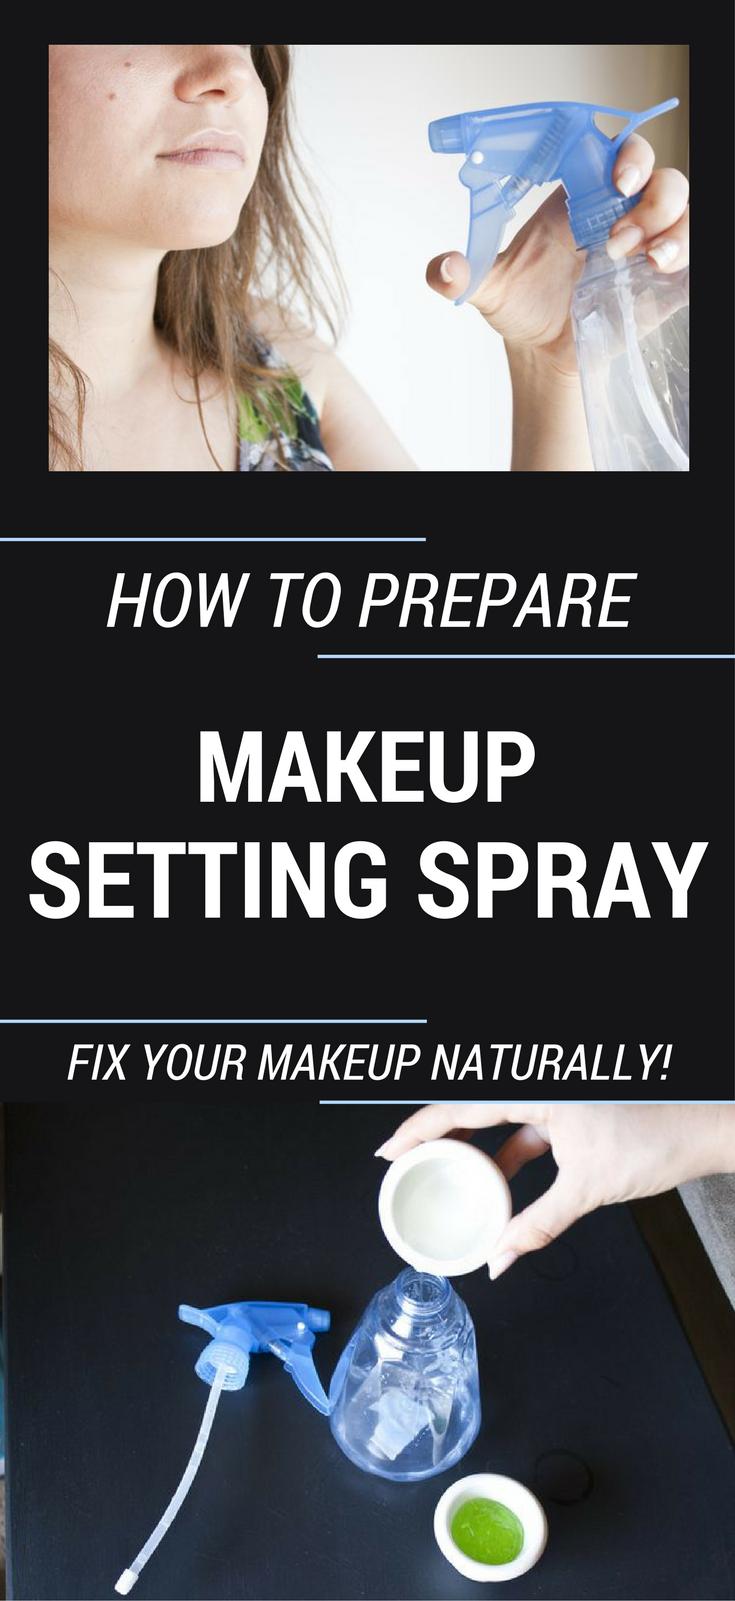 How To Prepare Makeup Setting Spray? Fix Your Makeup